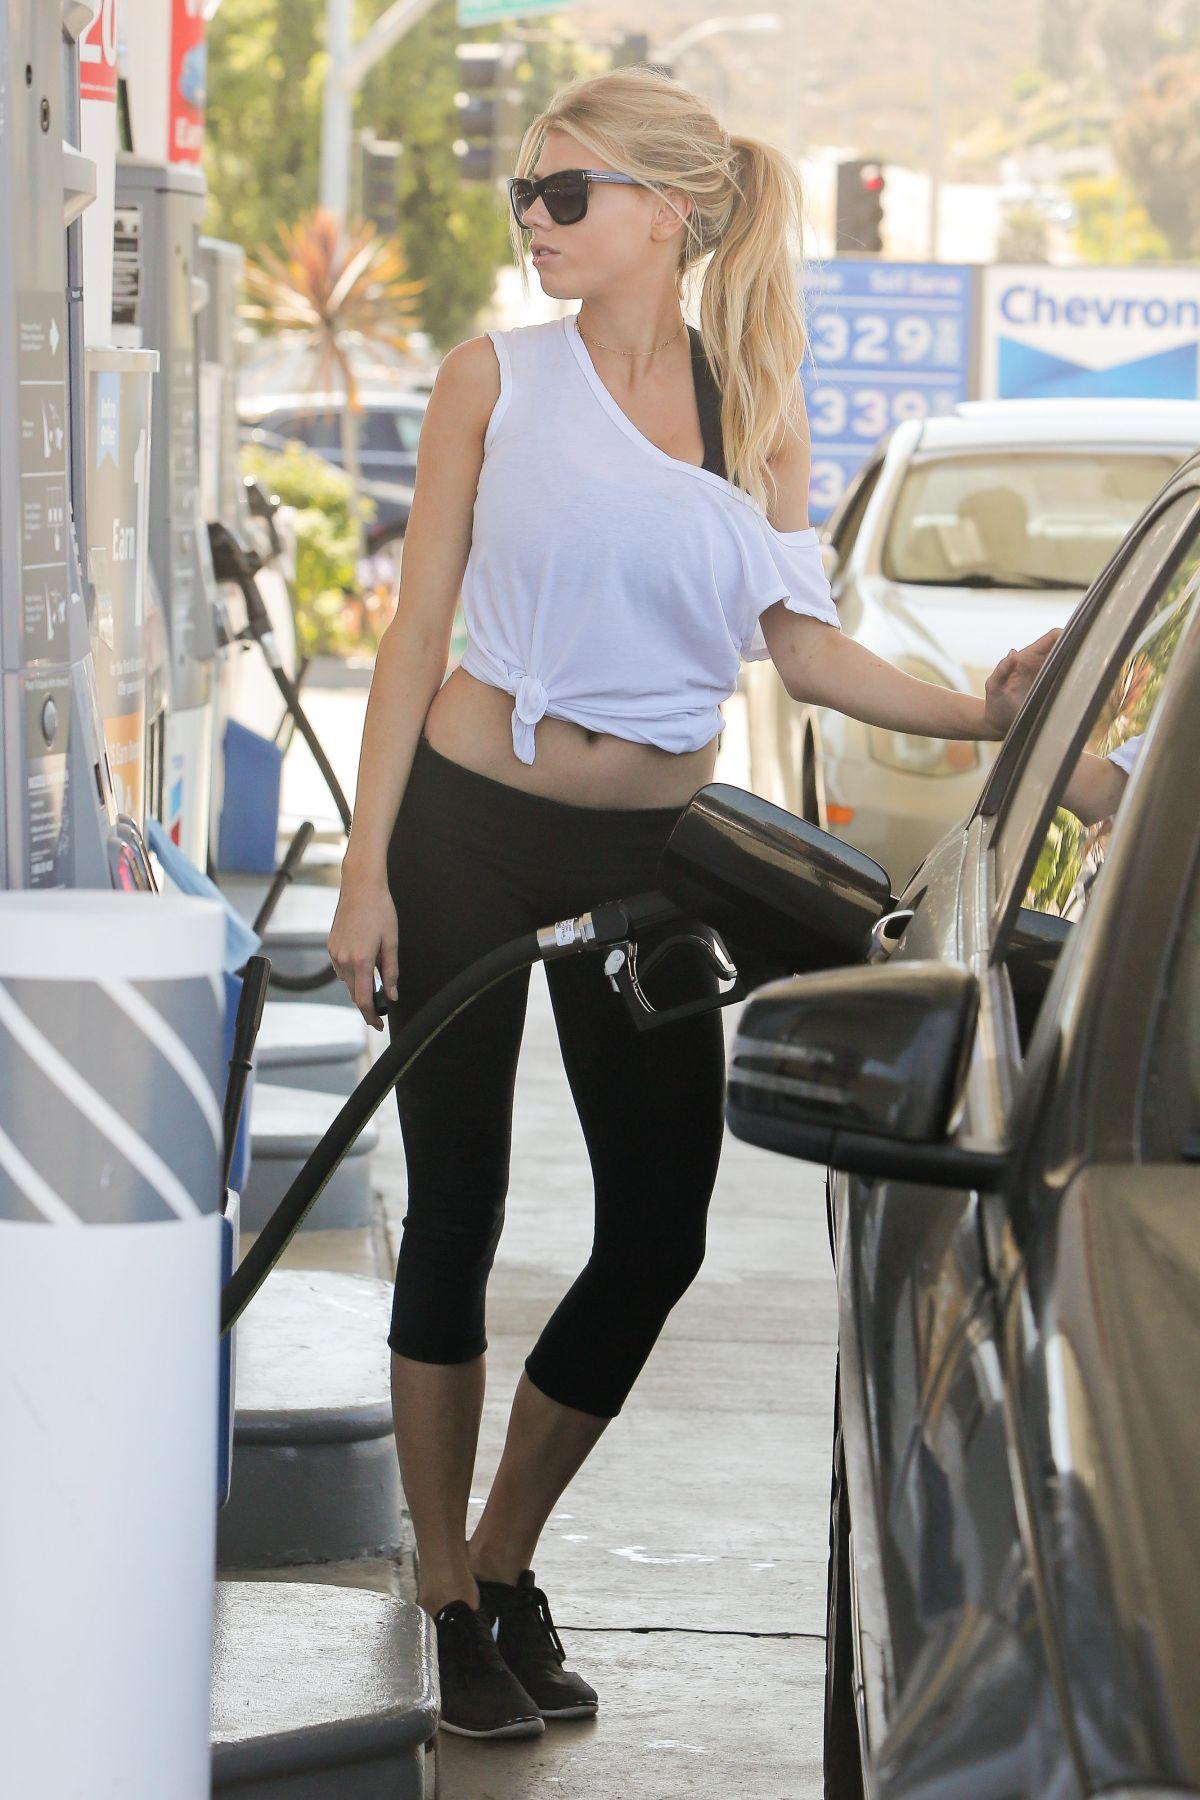 Charlotte Mckinney At A Gas Station In Malibu 05 22 2016